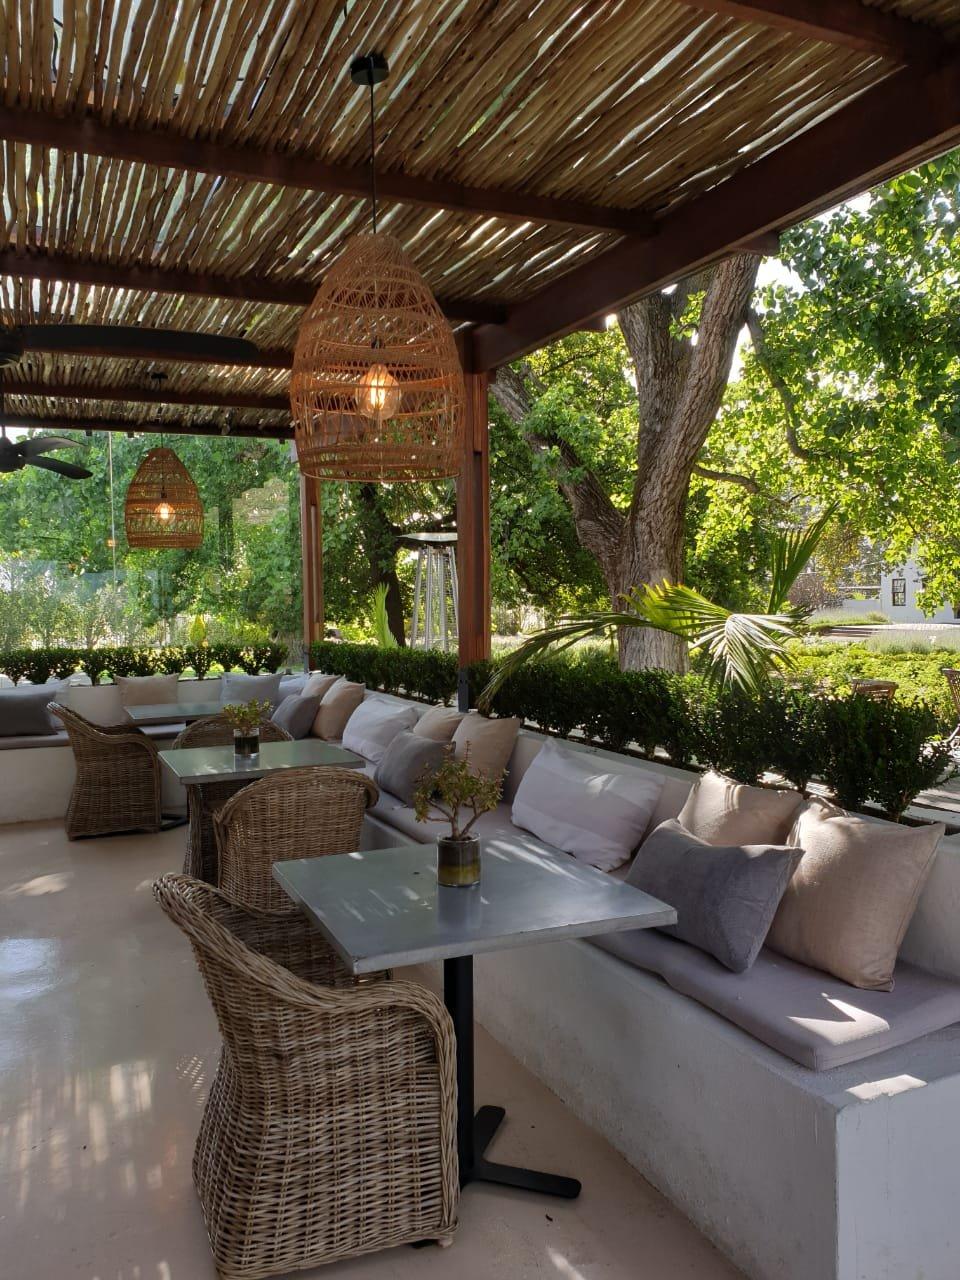 Shady verandah La Paris Bistro, Sonia Cabano blog eatdrinkcapetown